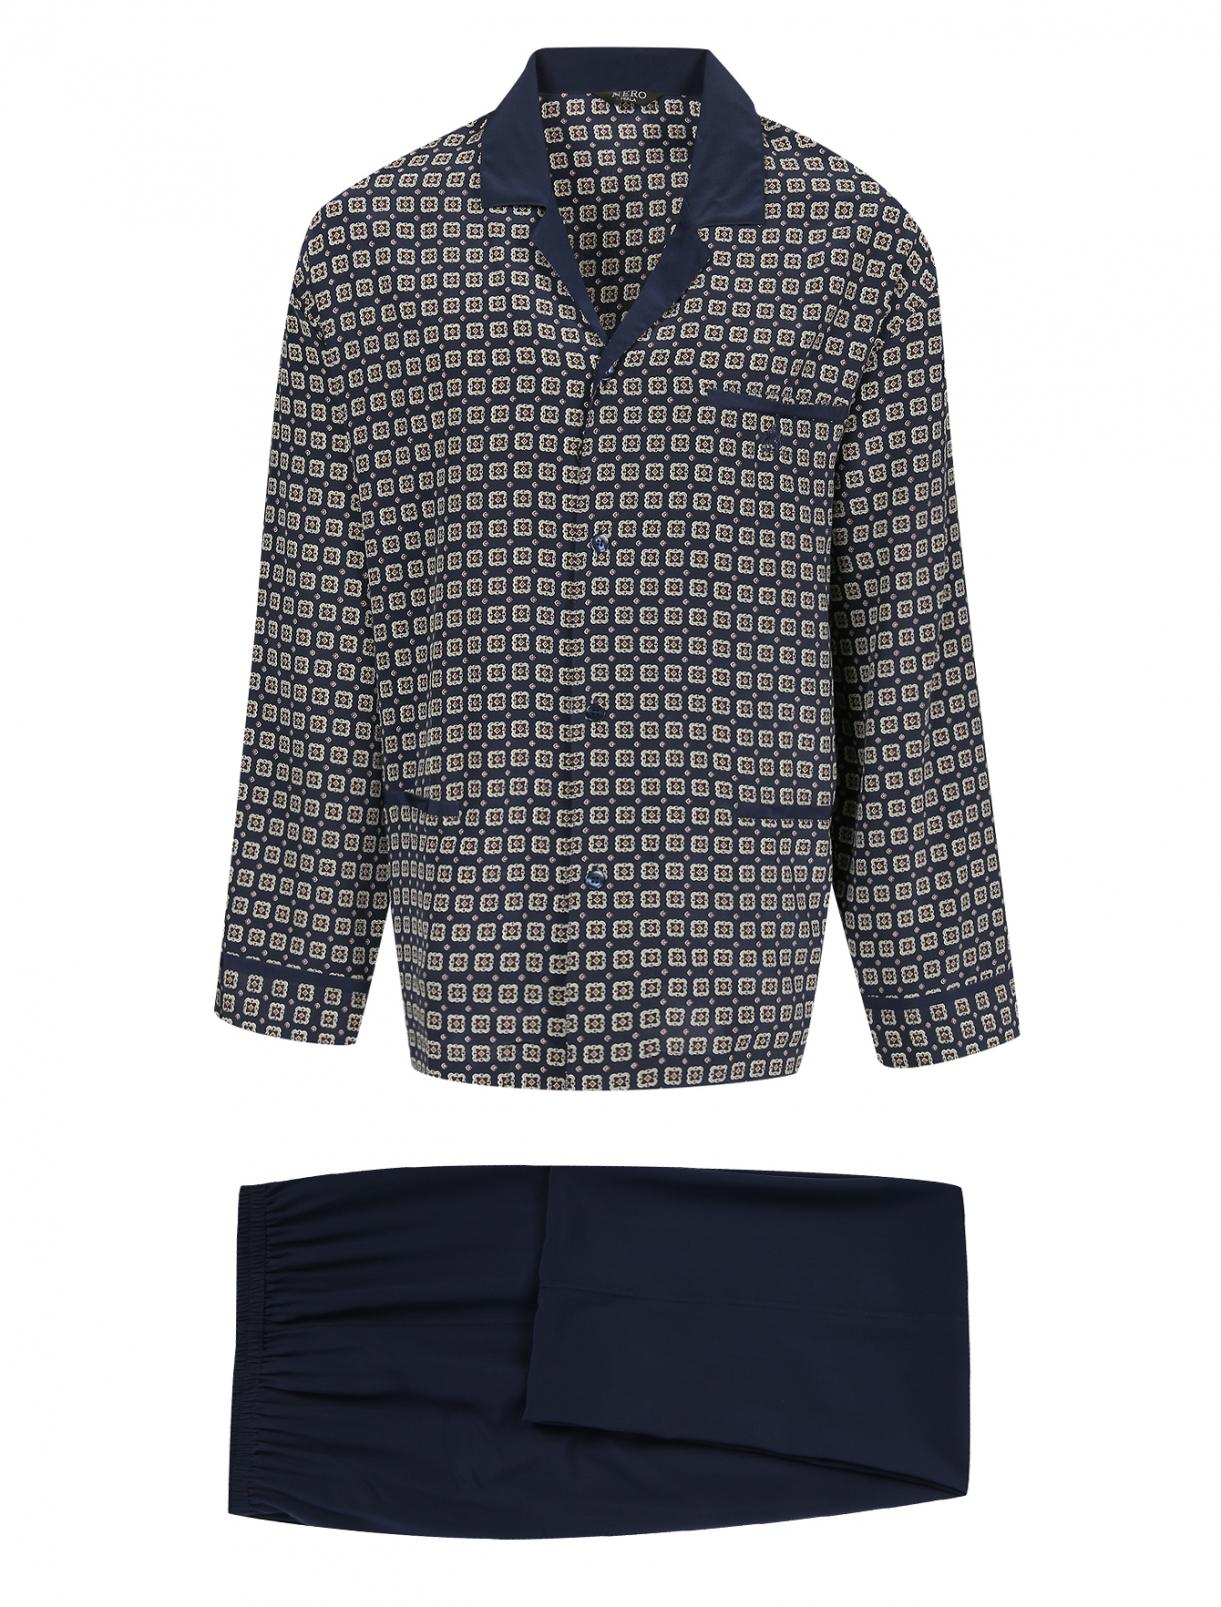 Пижама из шелка с узором NERO PERLA  –  Общий вид